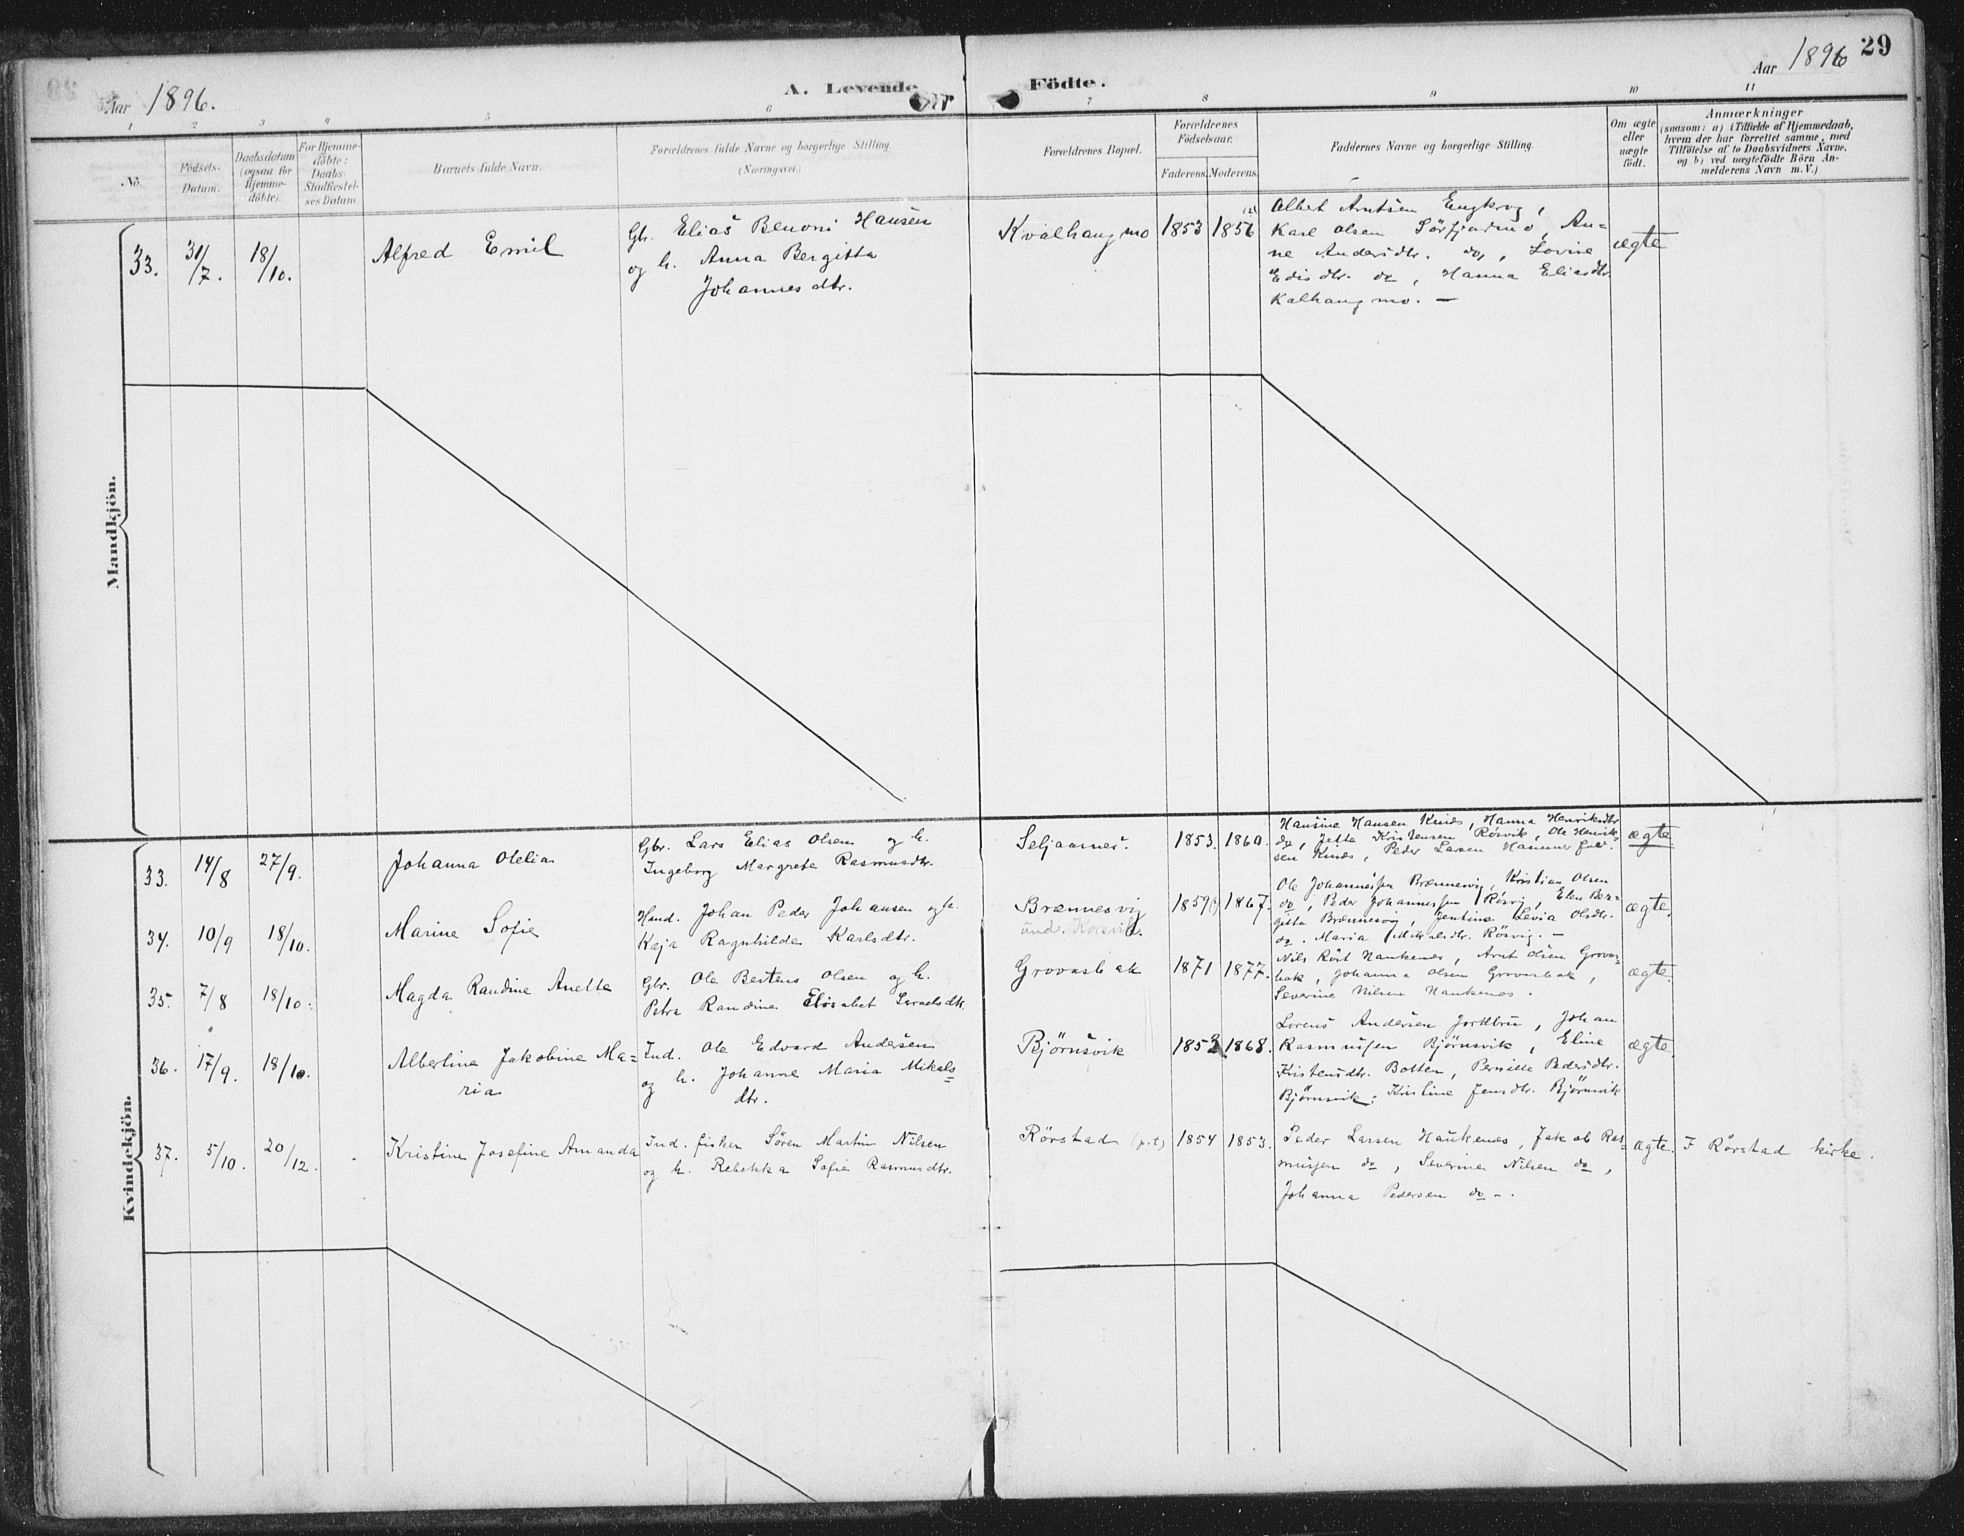 SAT, Ministerialprotokoller, klokkerbøker og fødselsregistre - Nordland, 854/L0779: Ministerialbok nr. 854A02, 1892-1909, s. 29